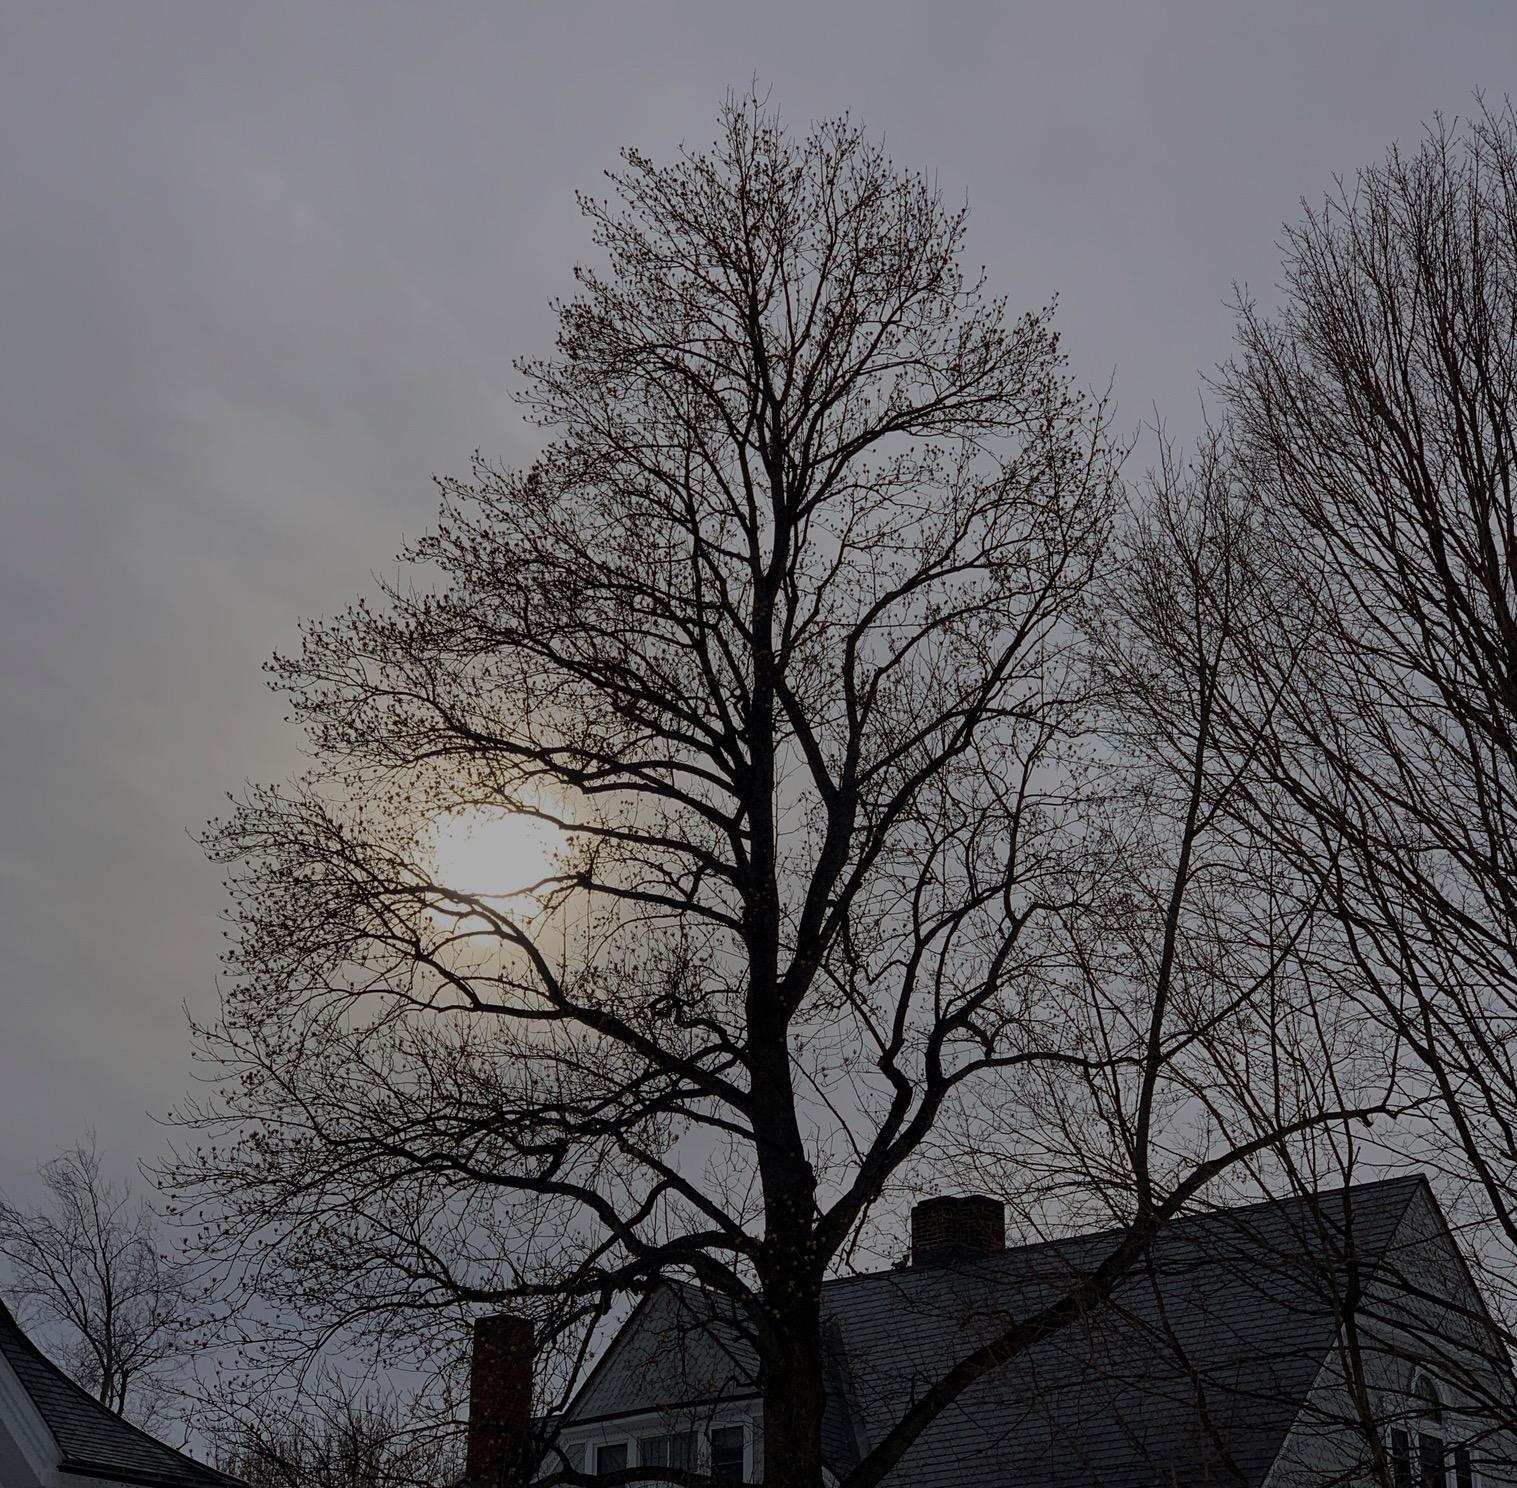 Screen Shot 2019-03-11 at 10.34.07 AM.jpg